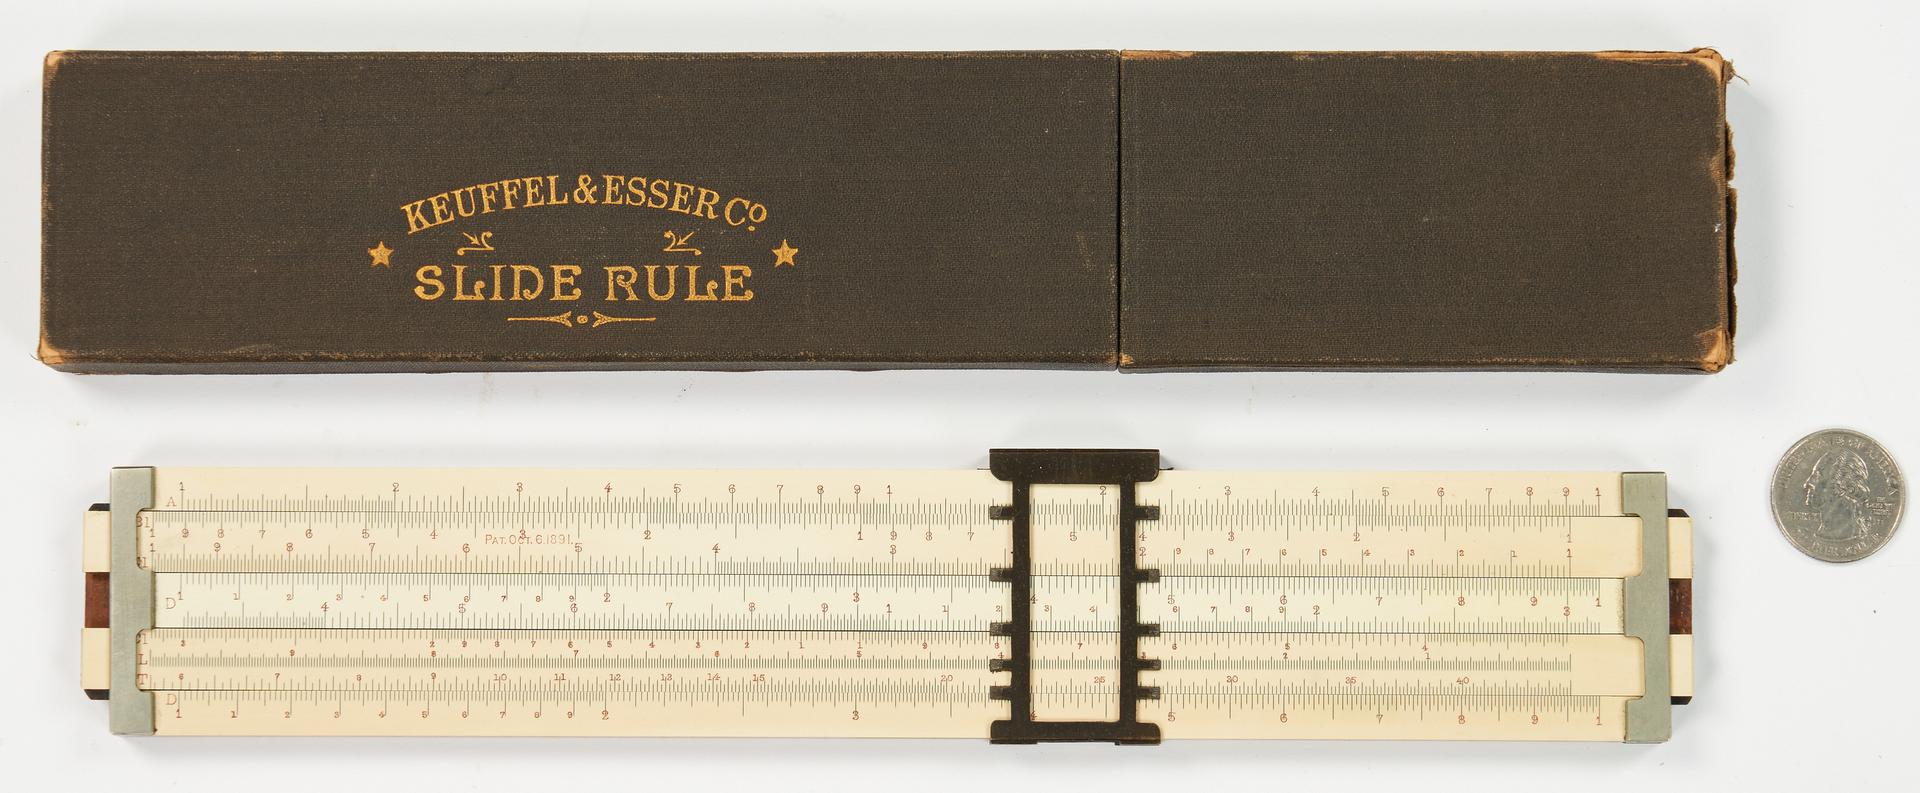 Lot 792: Keuffel and Esser 4090 Universal Slide Rule